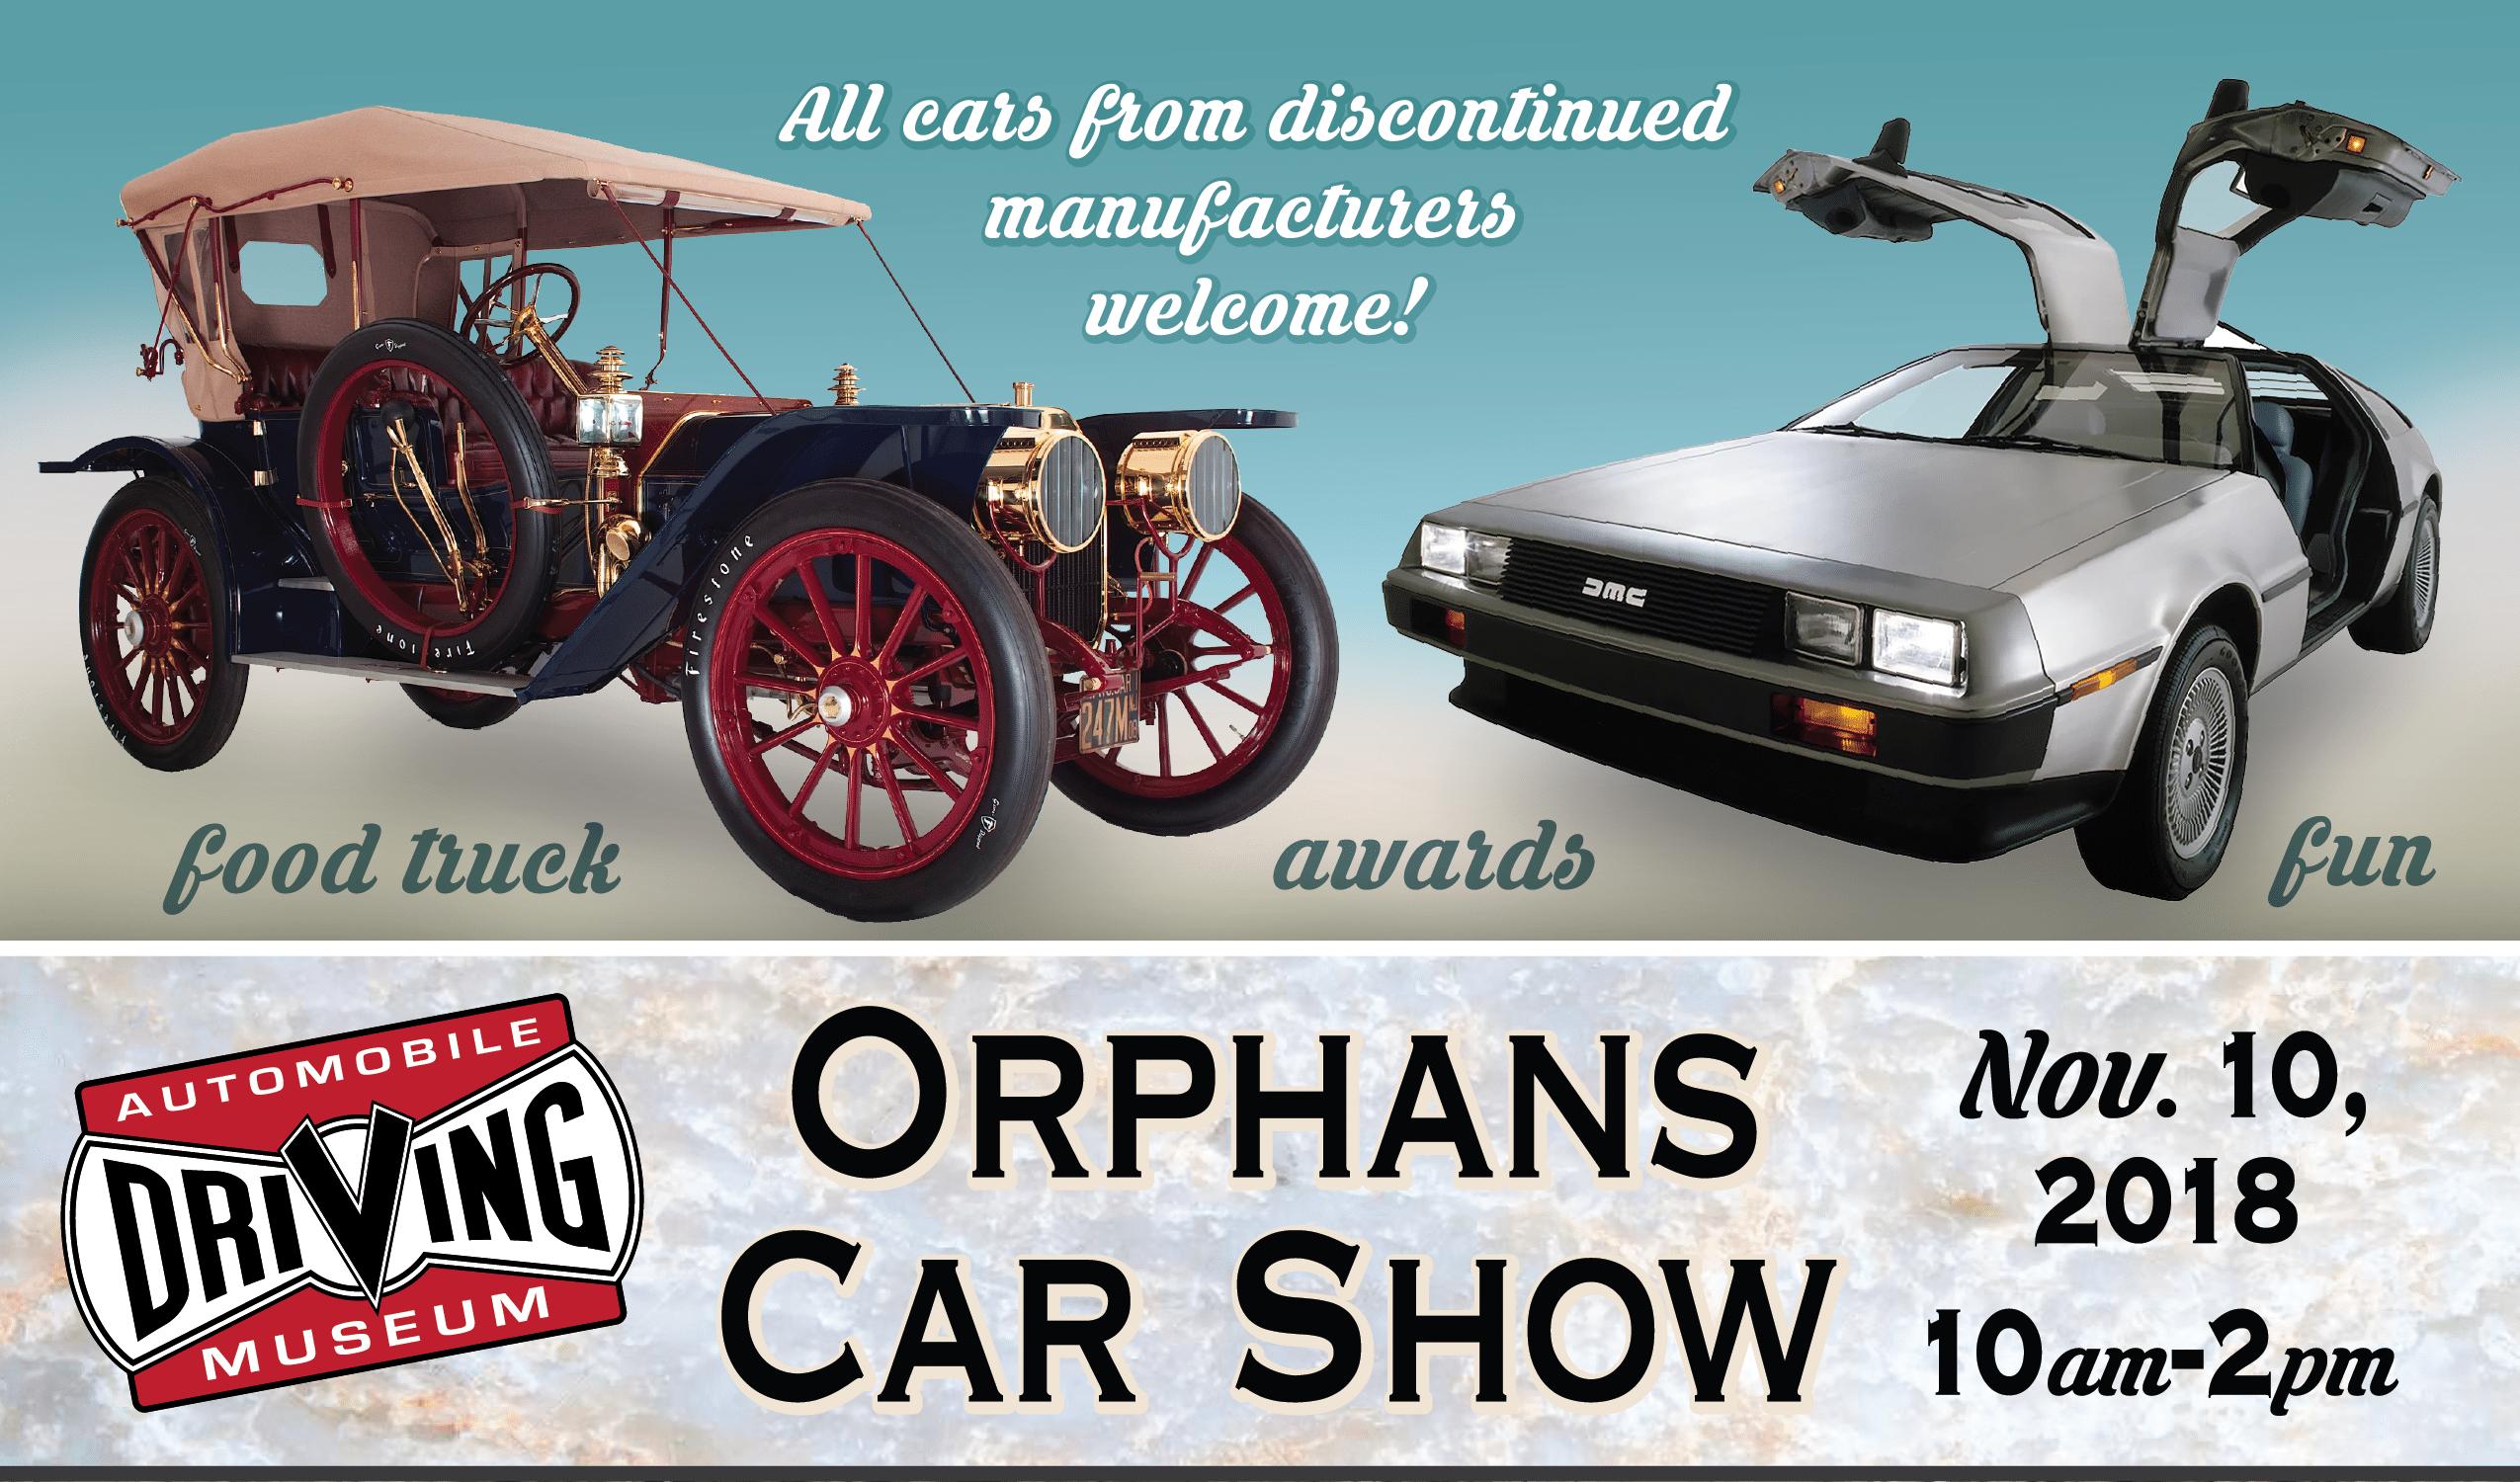 Automobile Driving Museum Corporate Wedding Special Events Venue